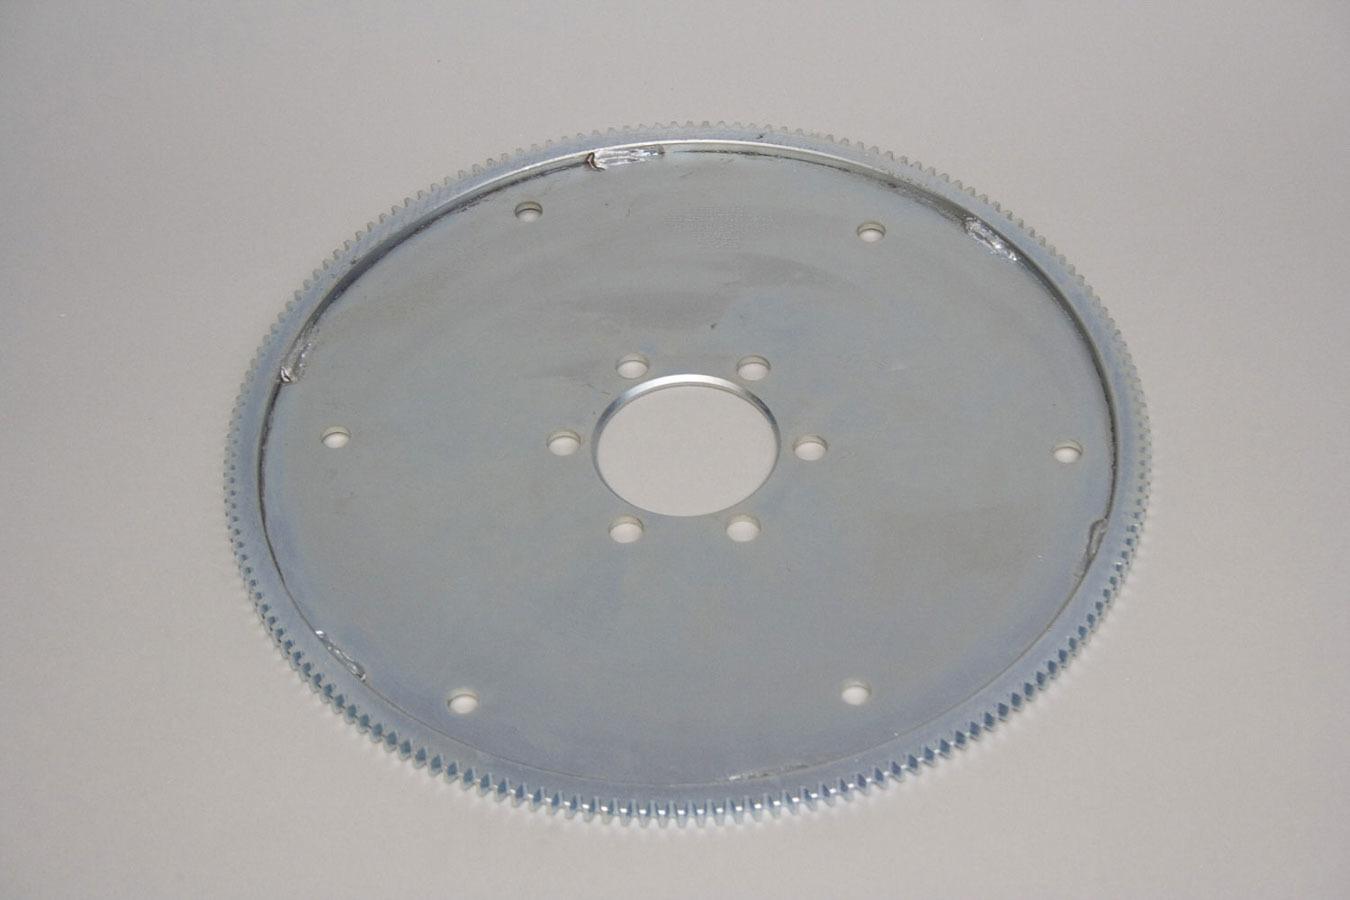 PRW Industries 1845503 Flexplate, Xtreme Duty Platinum, High Inertia, 166 Tooth, SFI 29.1, Steel, Internal Balance, Pontiac V8, Each